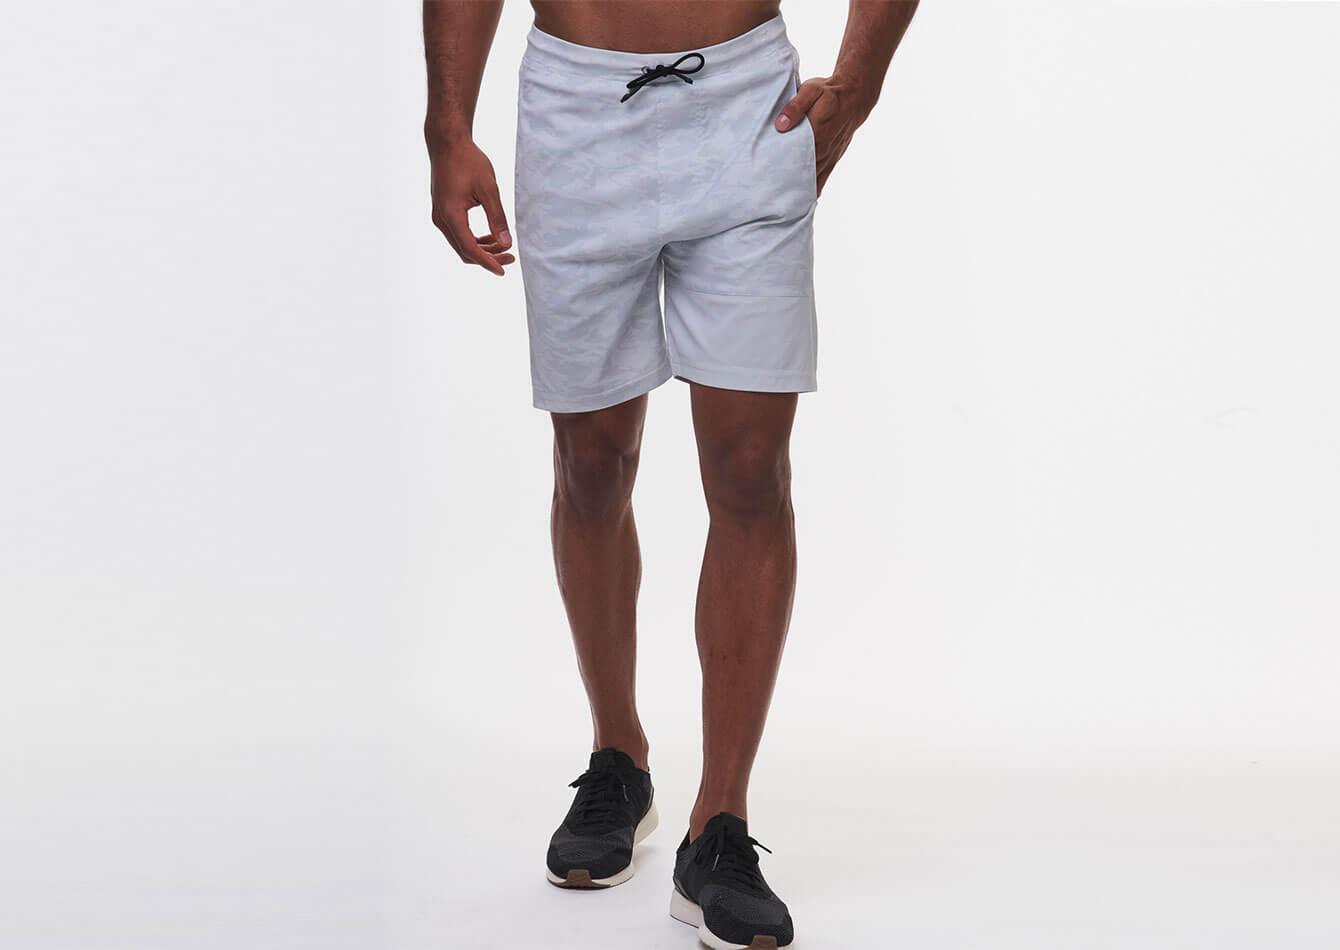 Edge 2-in-1 Short - tasc performance shorts - (NauticalBlueTechDot)